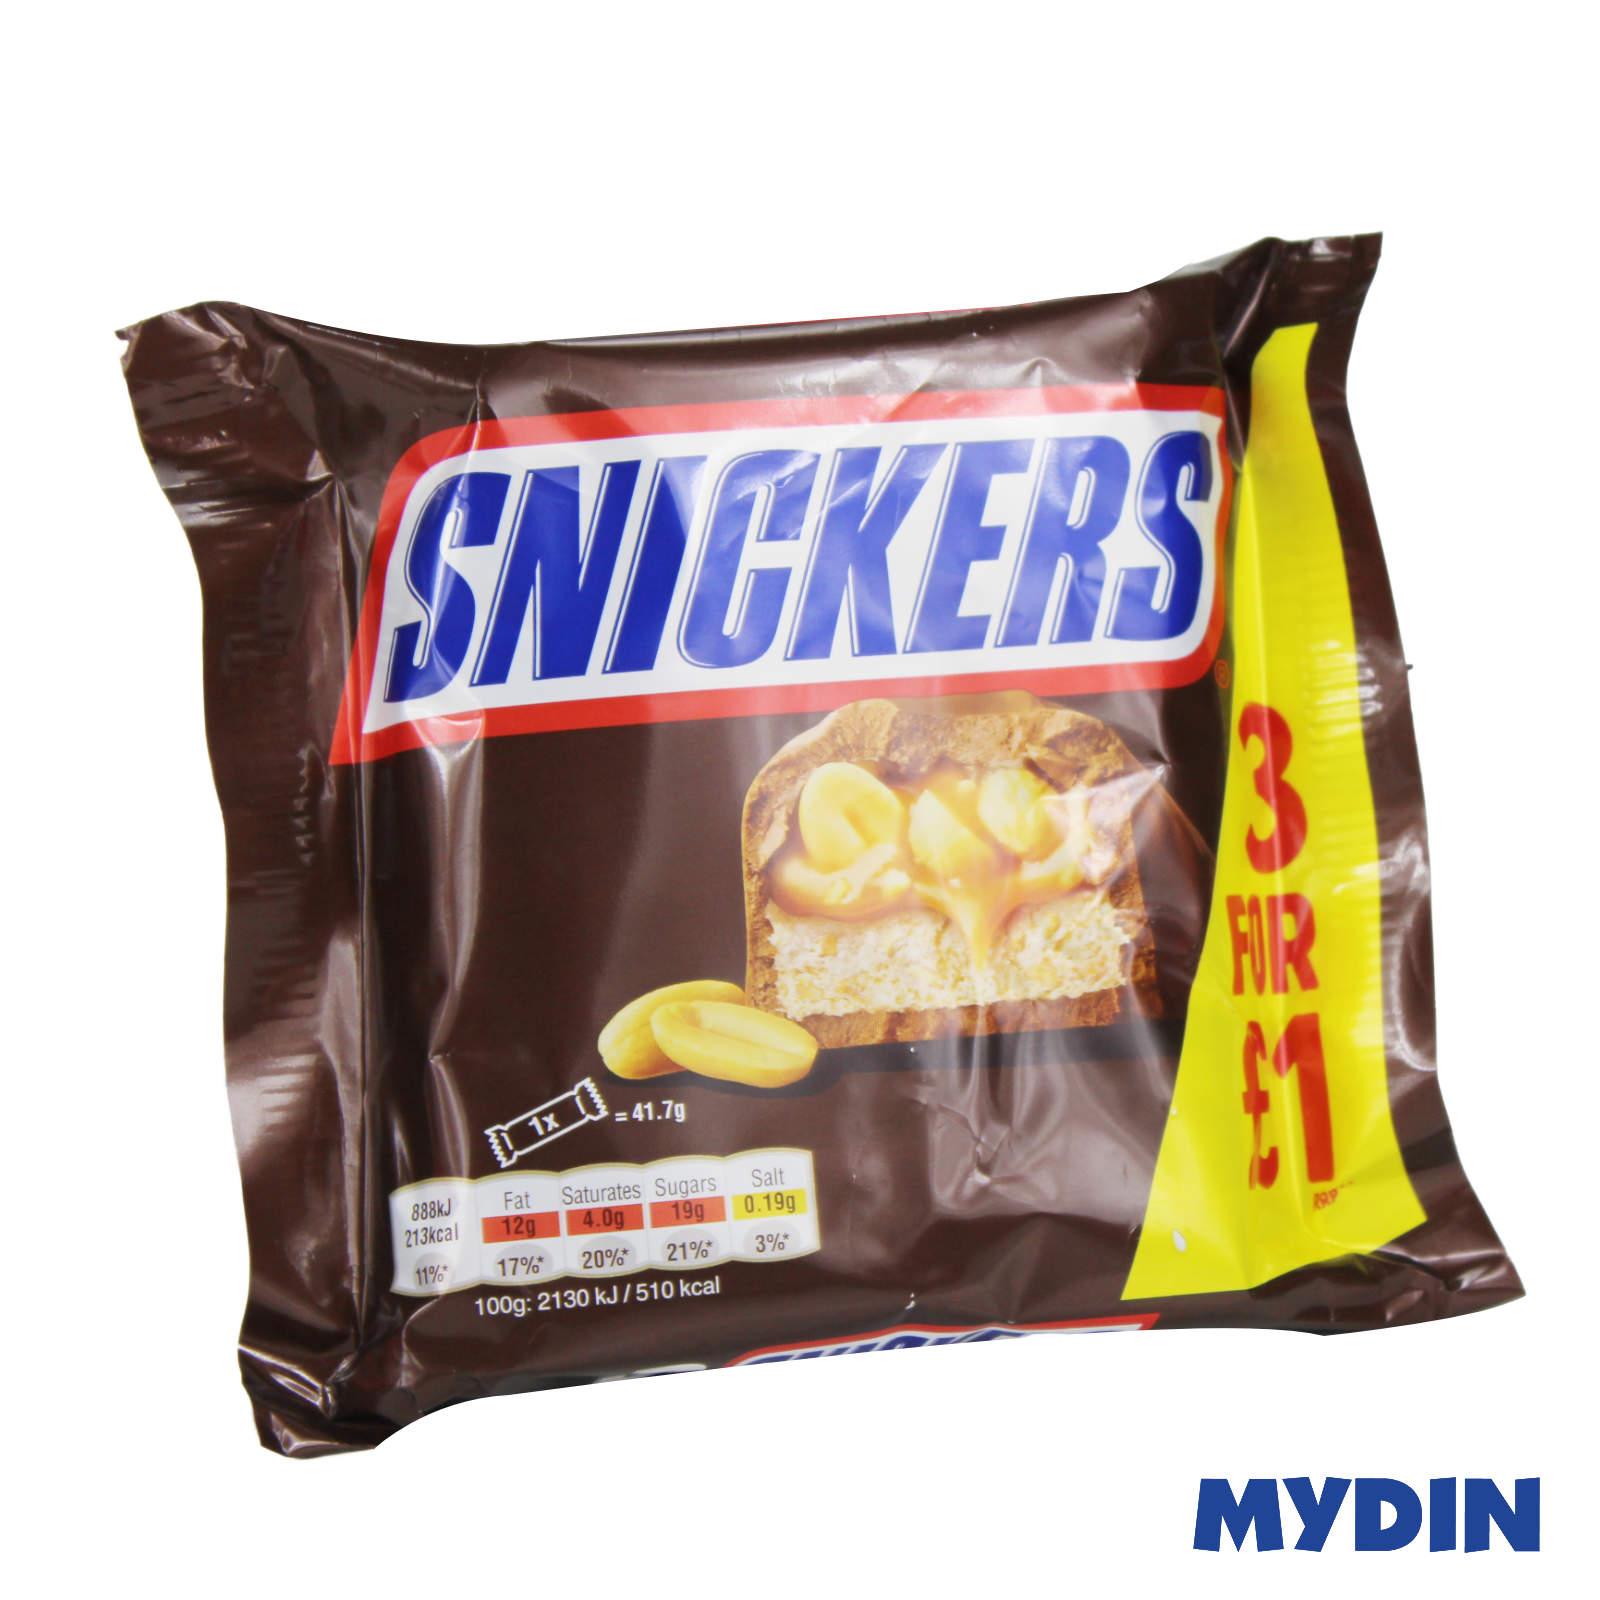 Snickers Snack Size Chocolate (41.7g x 3pcs) Expiry 10/07/2021